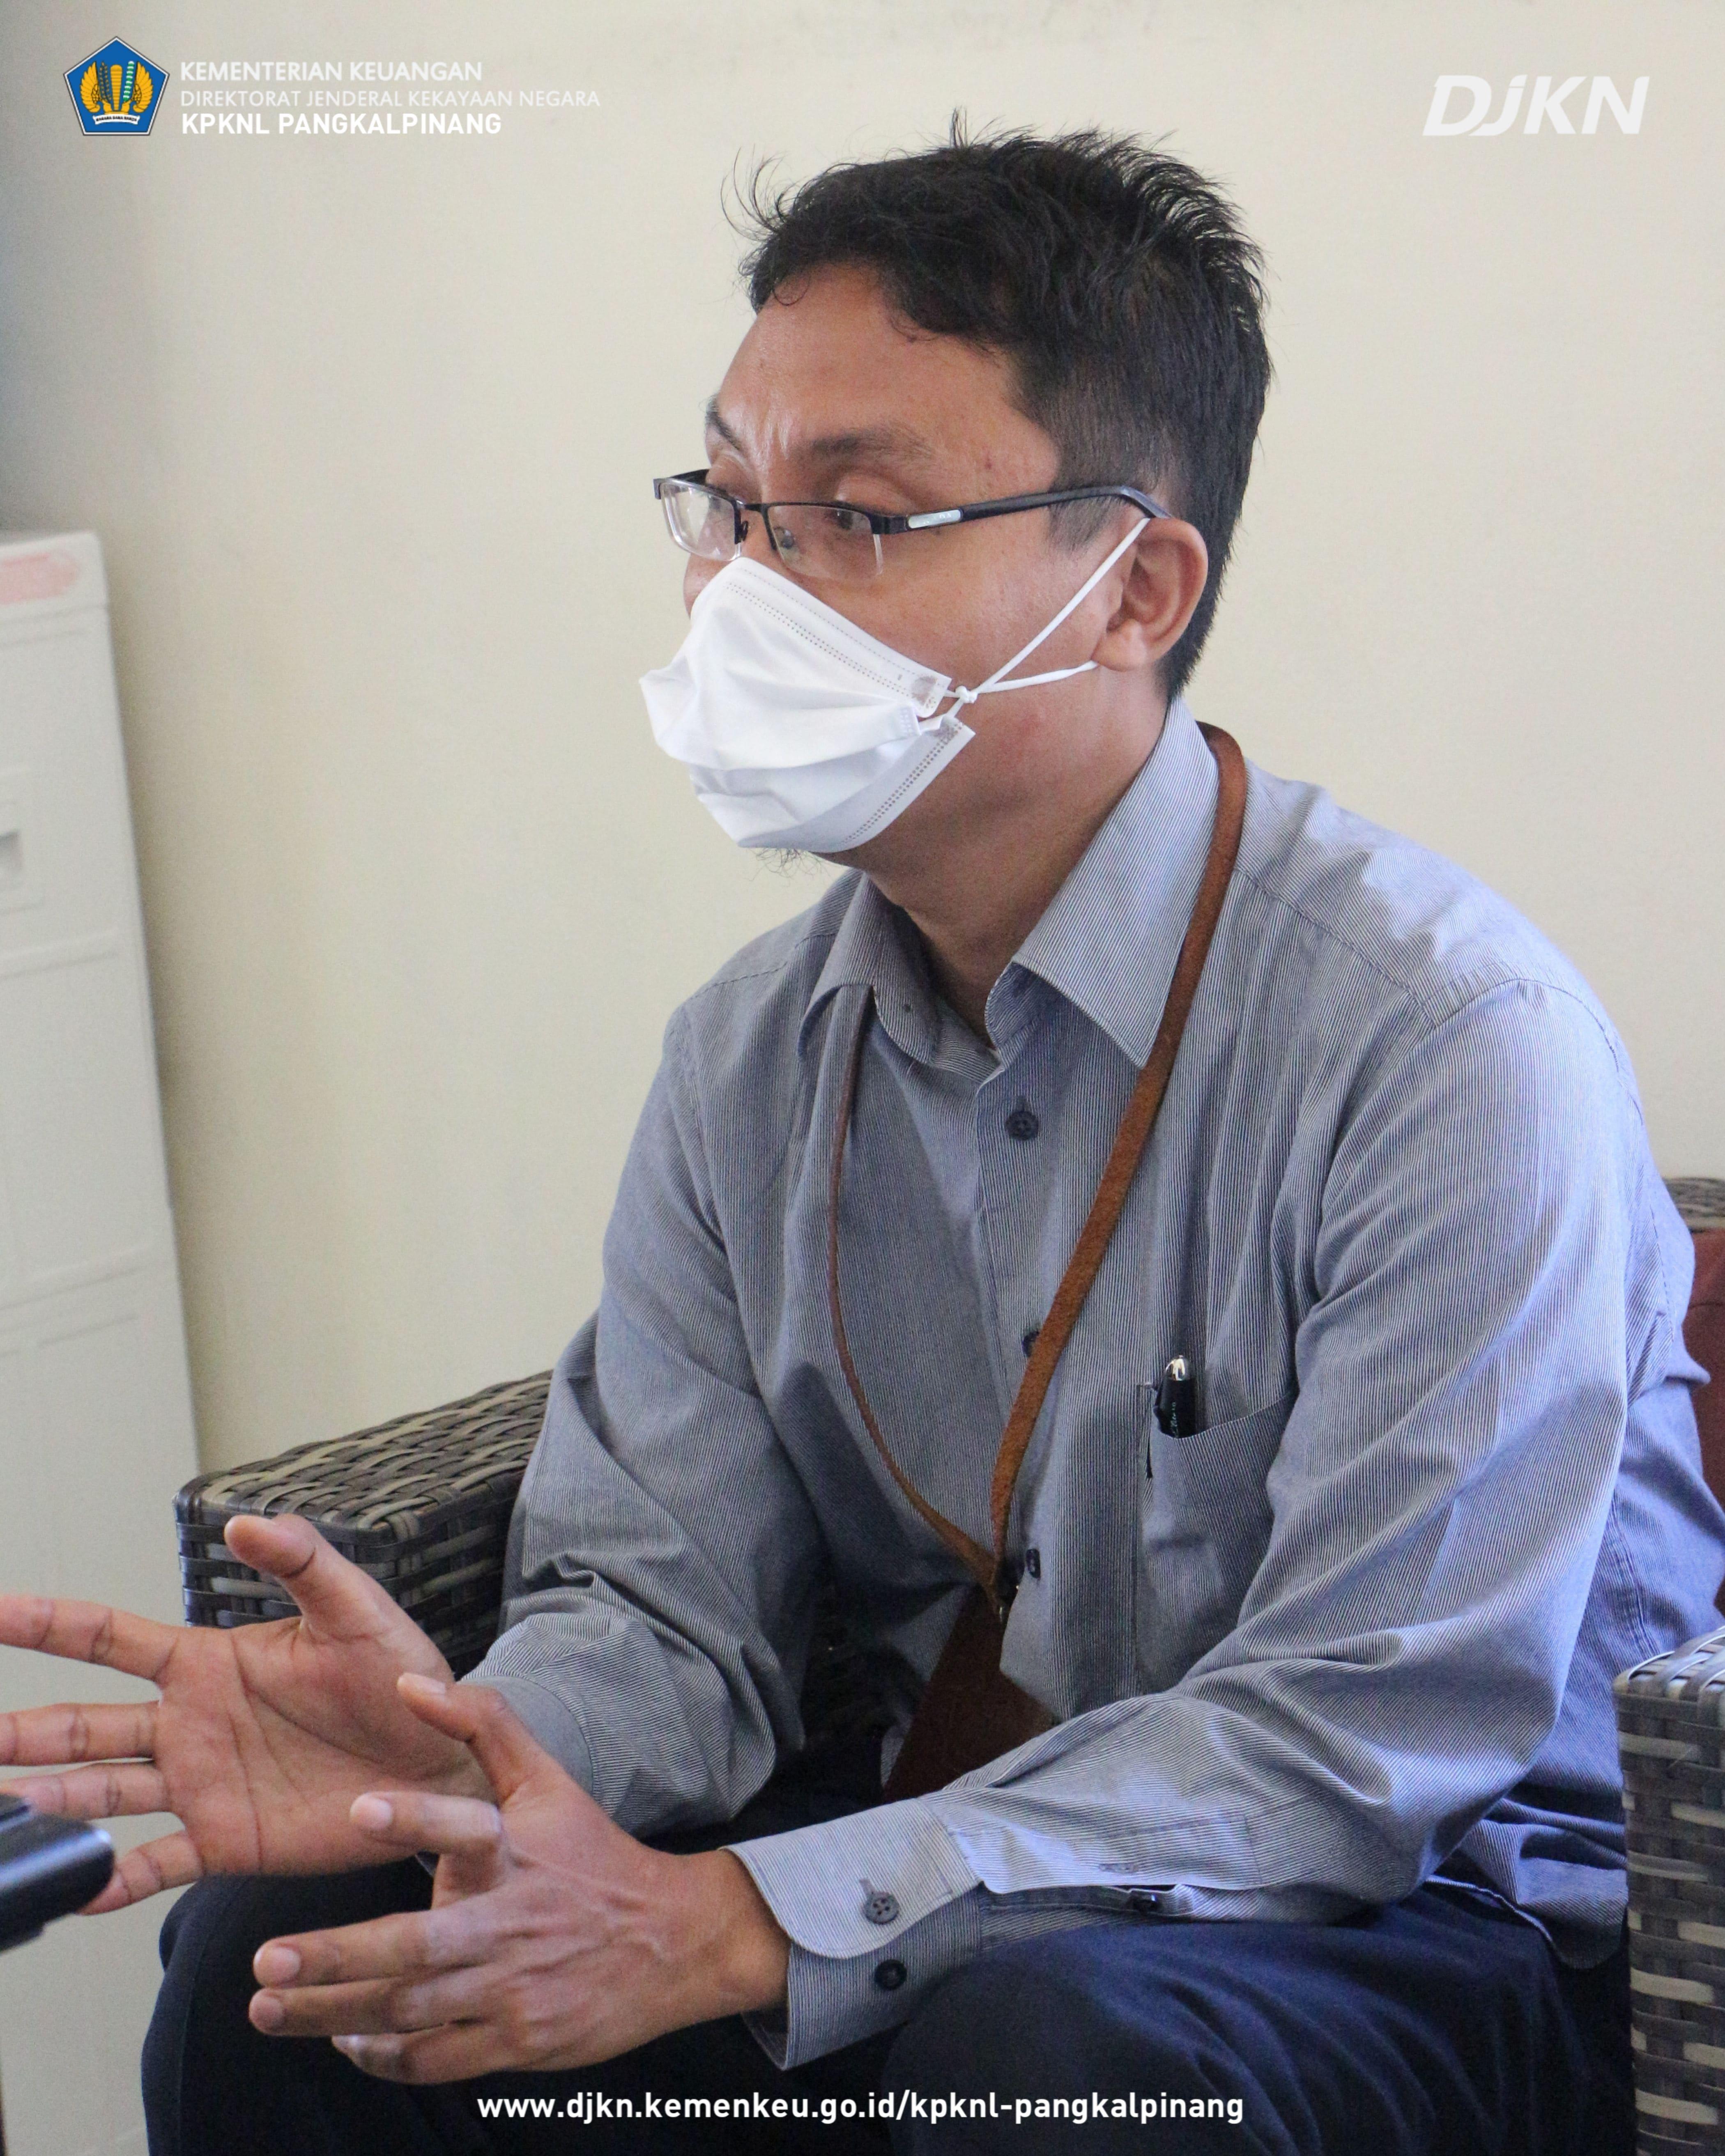 Guna Optimalkan Penggunaan BMN, KPKNL Pangkalpinang Lakukan Survey SBSK BMN Pada KPU Provinsi Kepulauan Bangka Belitung